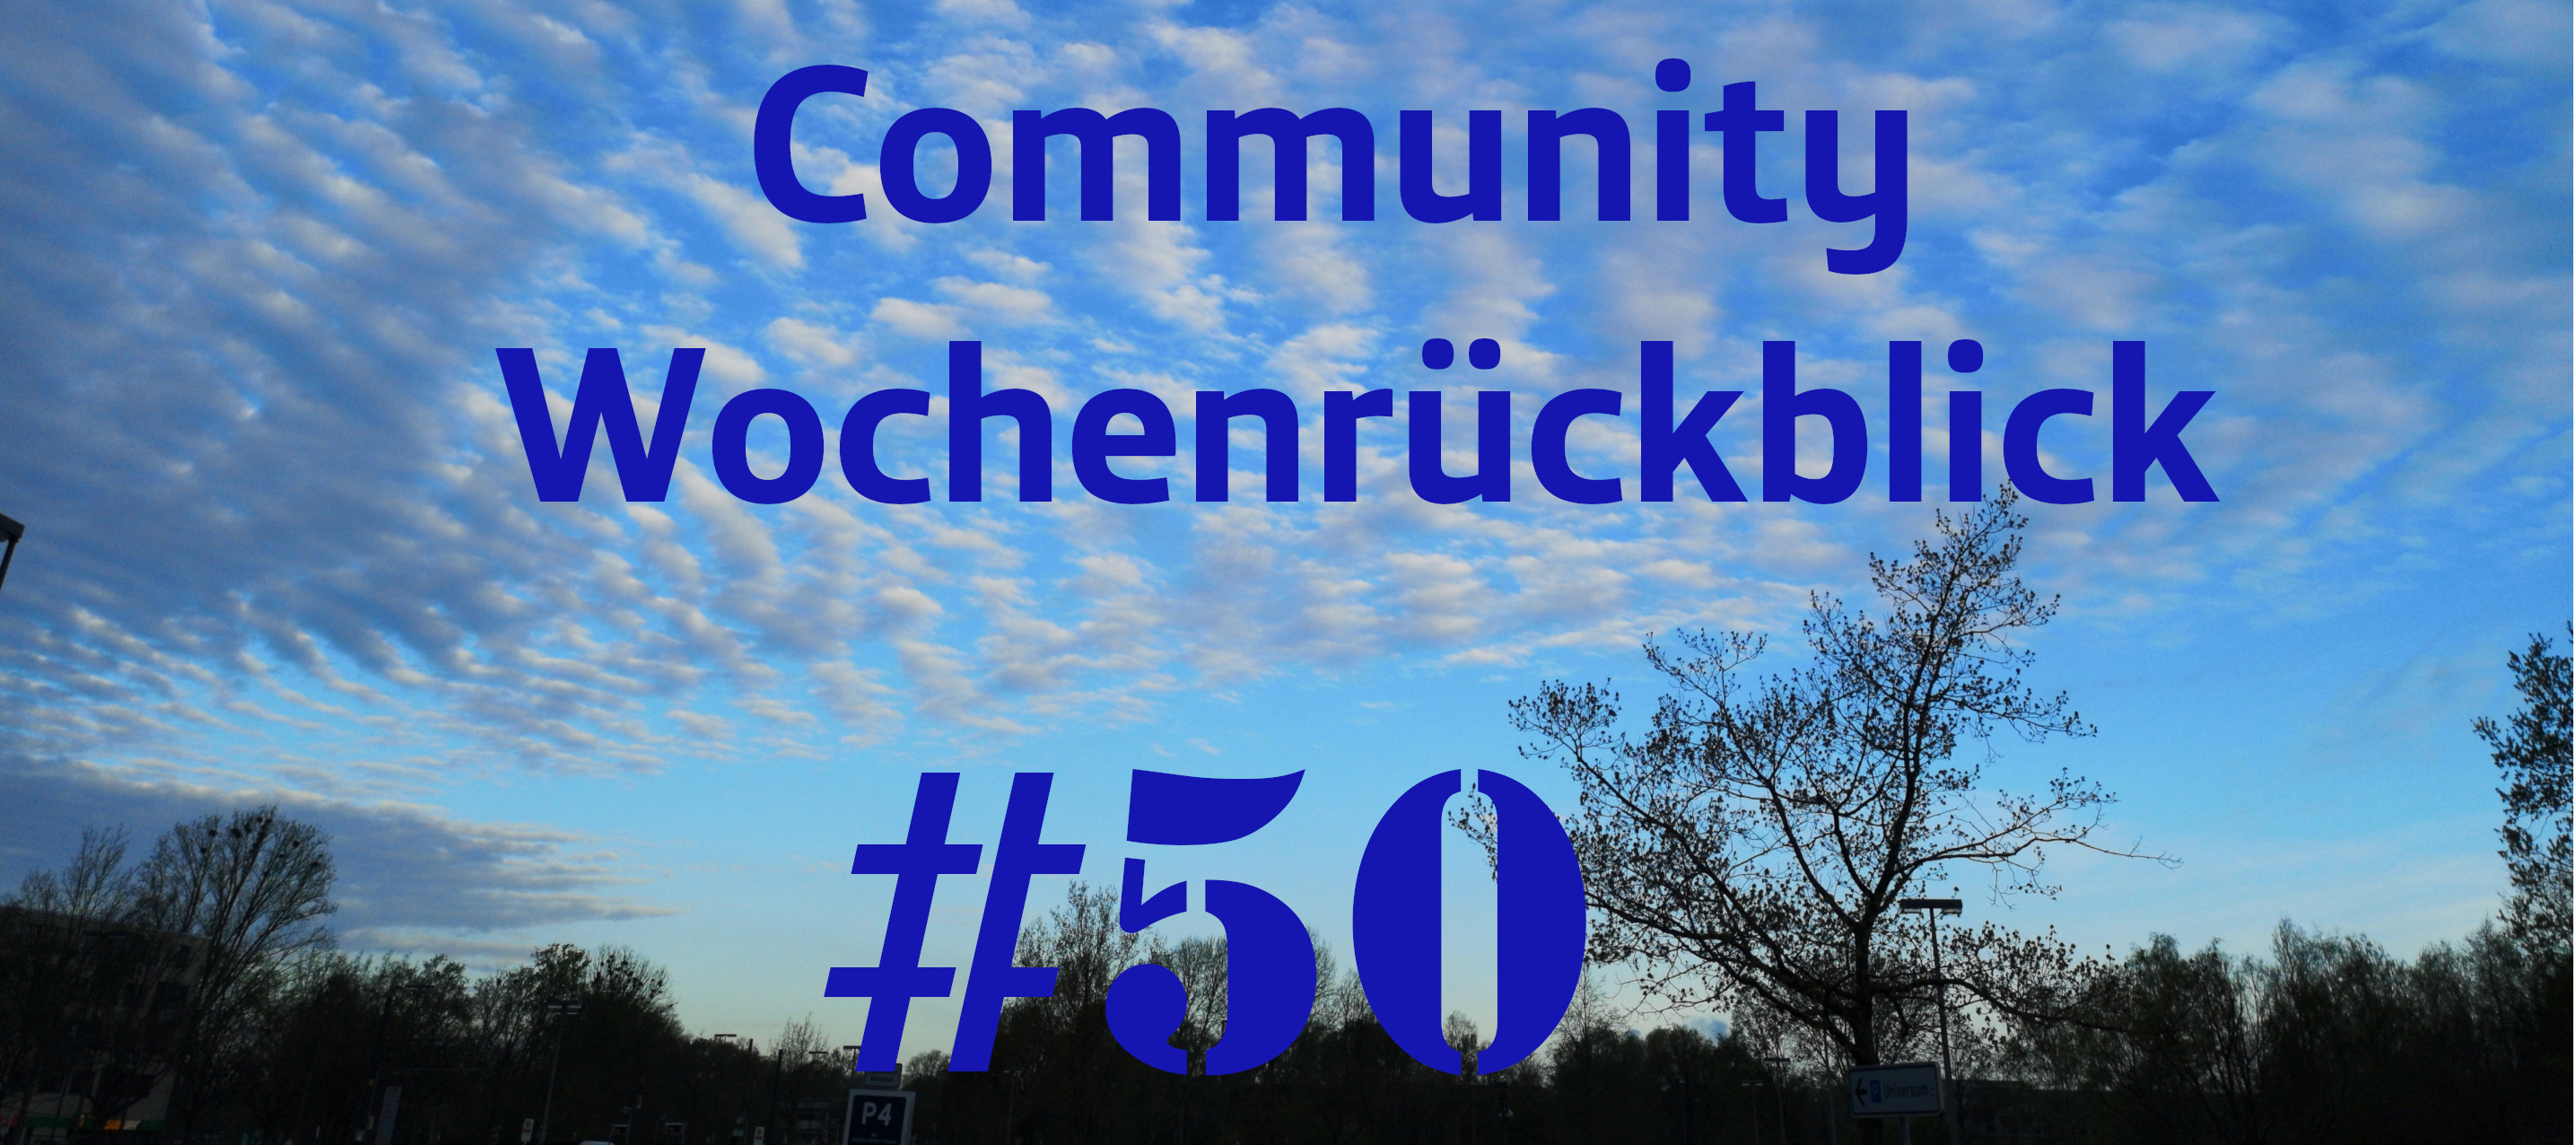 Community Wochenrückblick #50